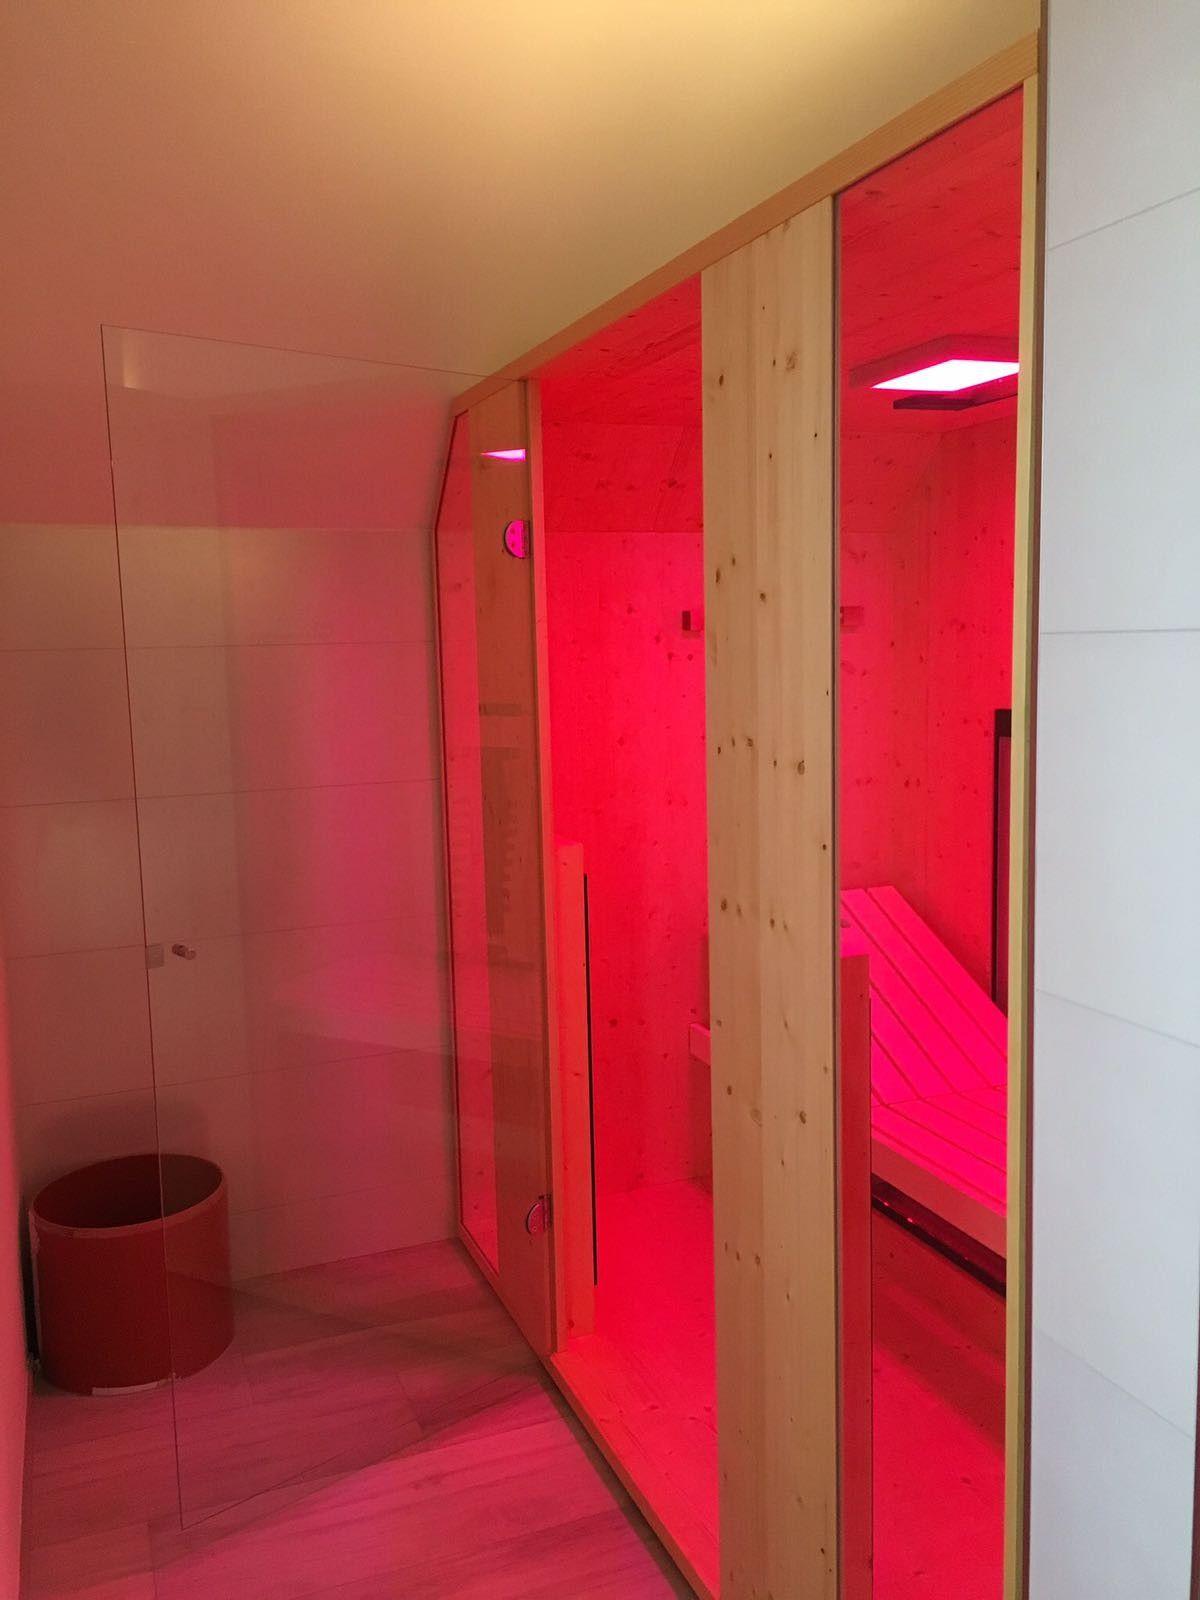 Wärmekabine im Badezimmer diese Infrarotkabine mit Tiefenwärme ...